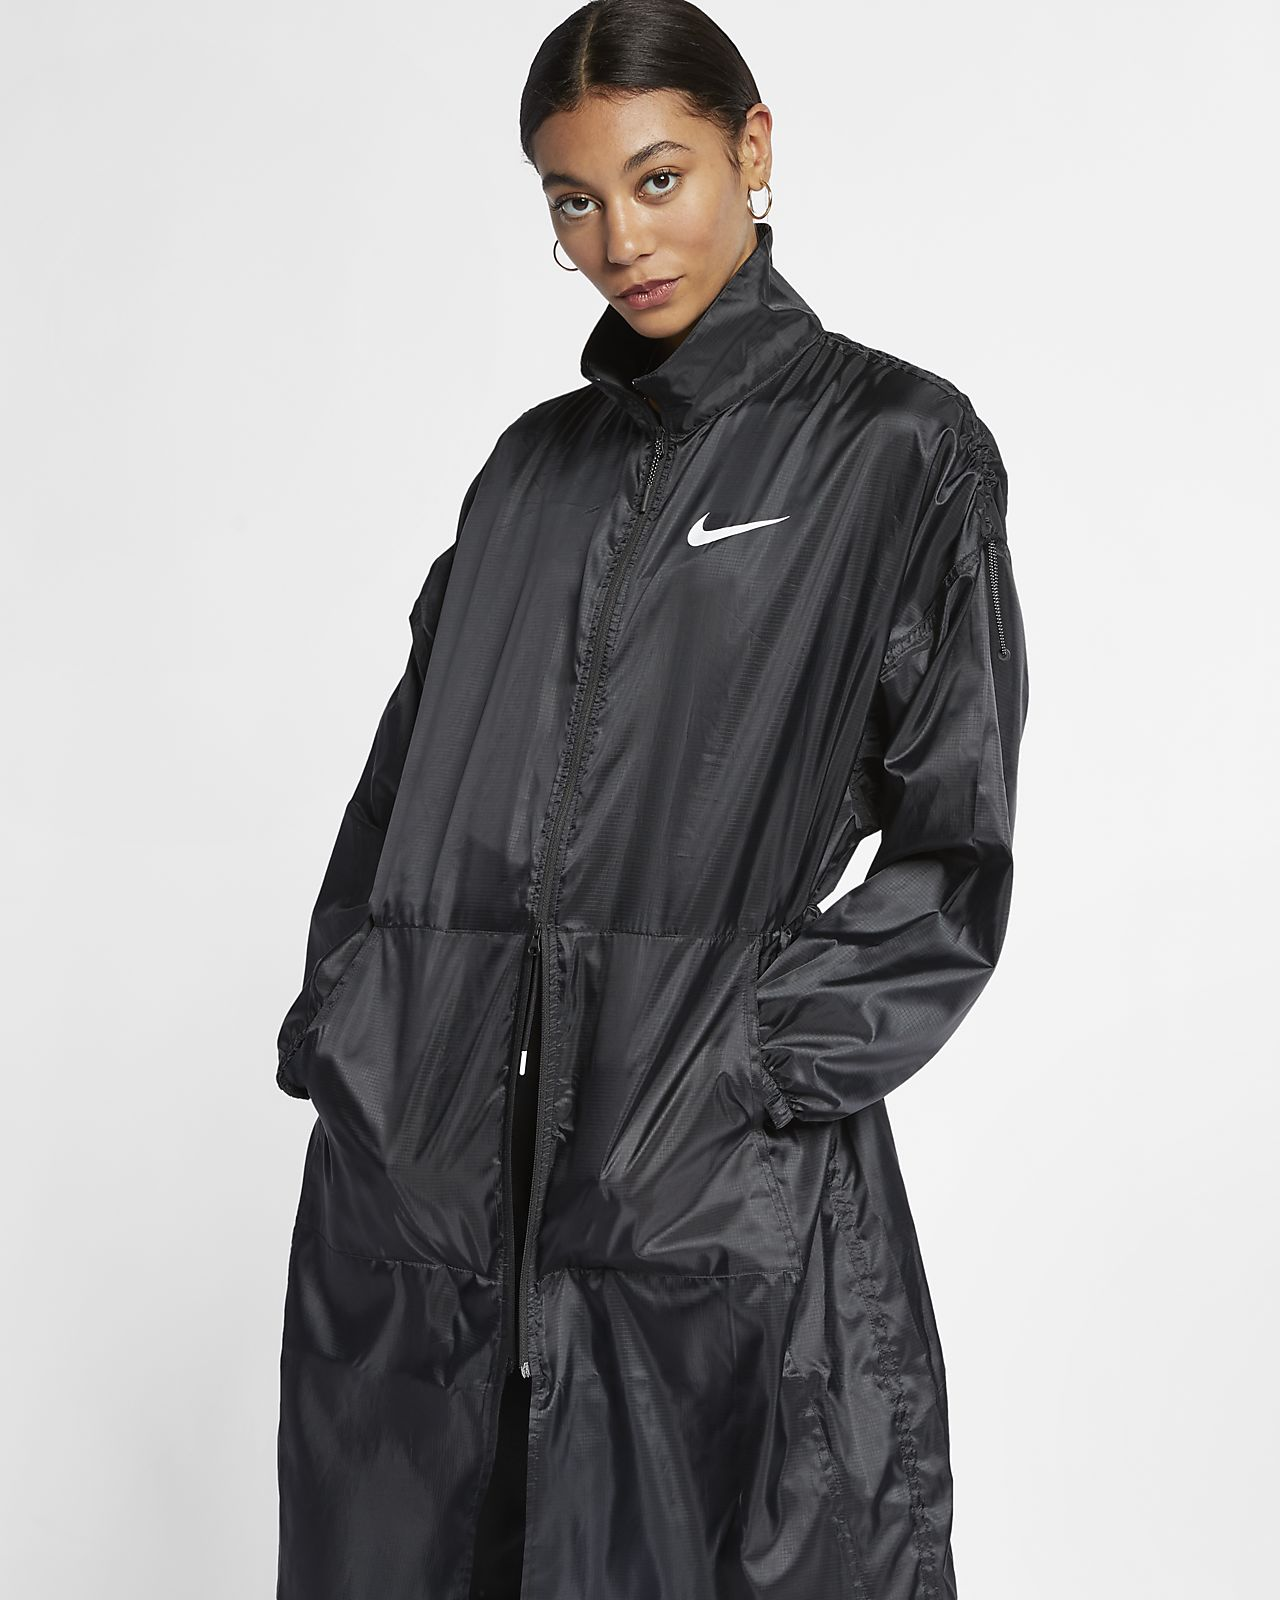 91148cf8f Nike Sportswear 'Swoosh' Lightweight Parka. Nike.com CA